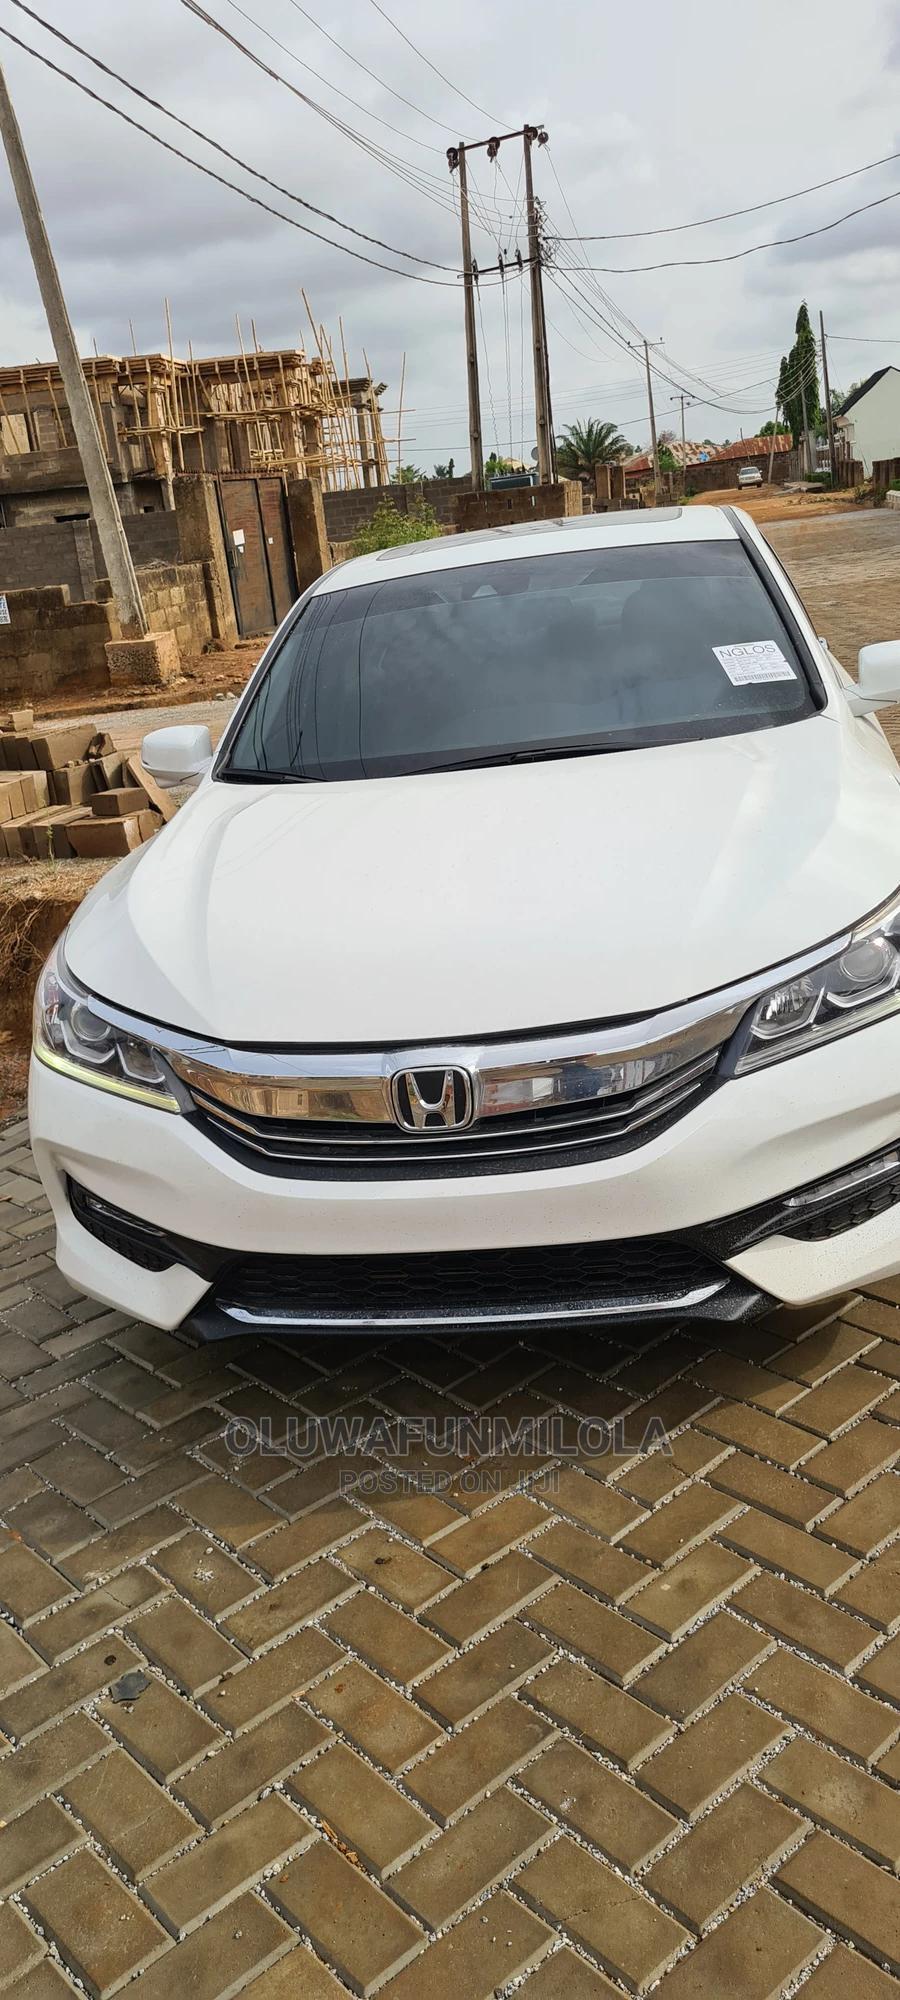 Archive: Honda Accord 2014 White